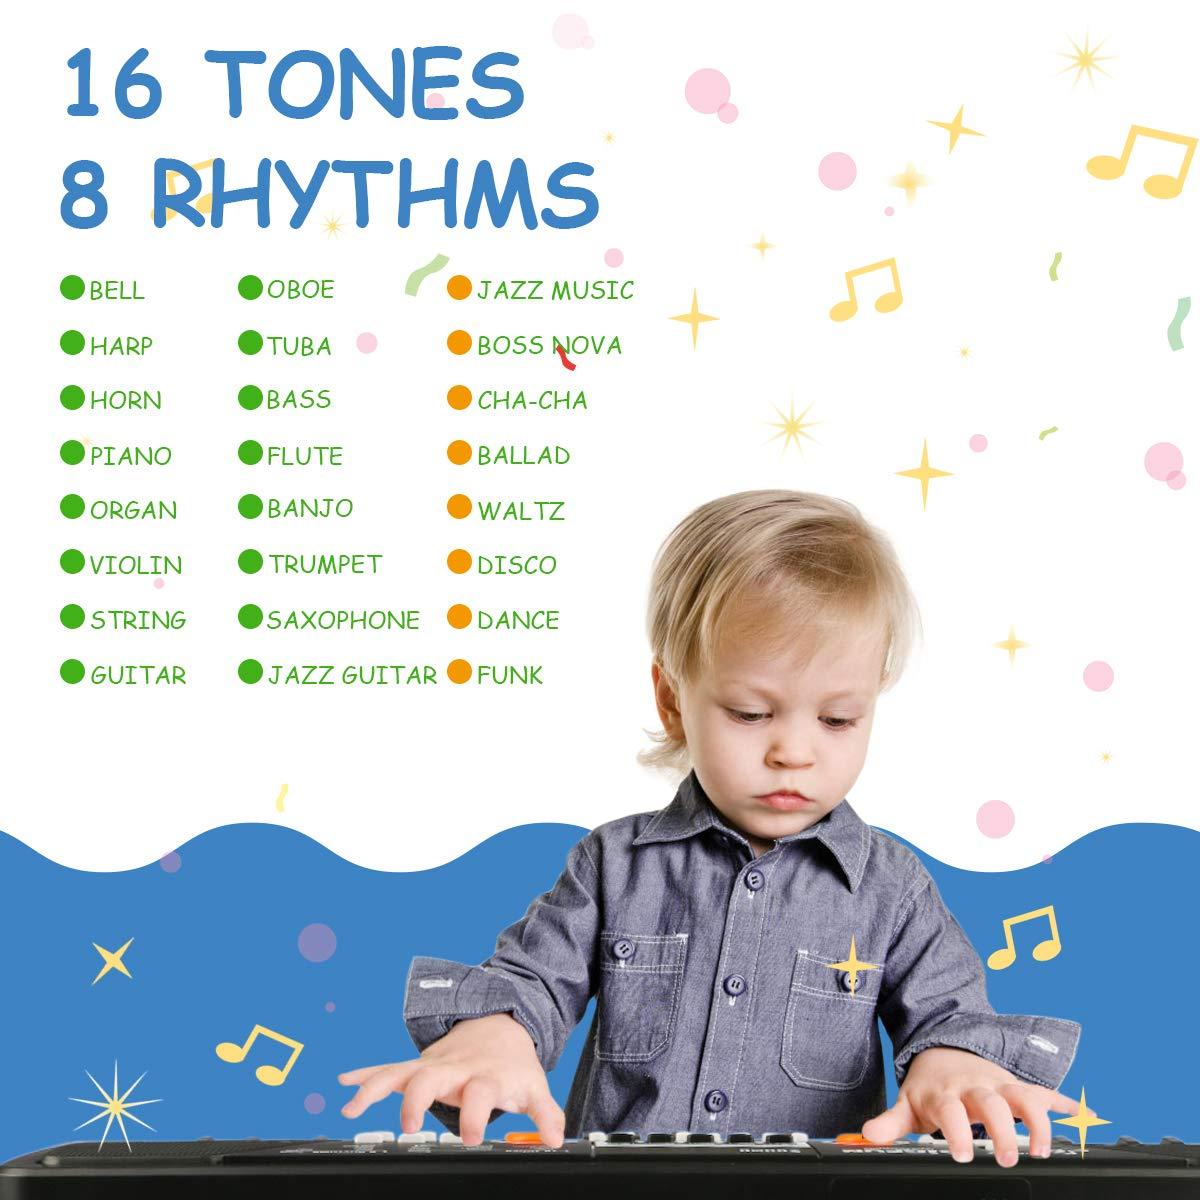 RenFox 49 Key Piano Keyboard Portable Electronic Kids Piano Keyboard Beginner Digital Music Piano Keyboard & Microphone Teaching Toy Gift for Kids Boy Girl by RenFox (Image #3)